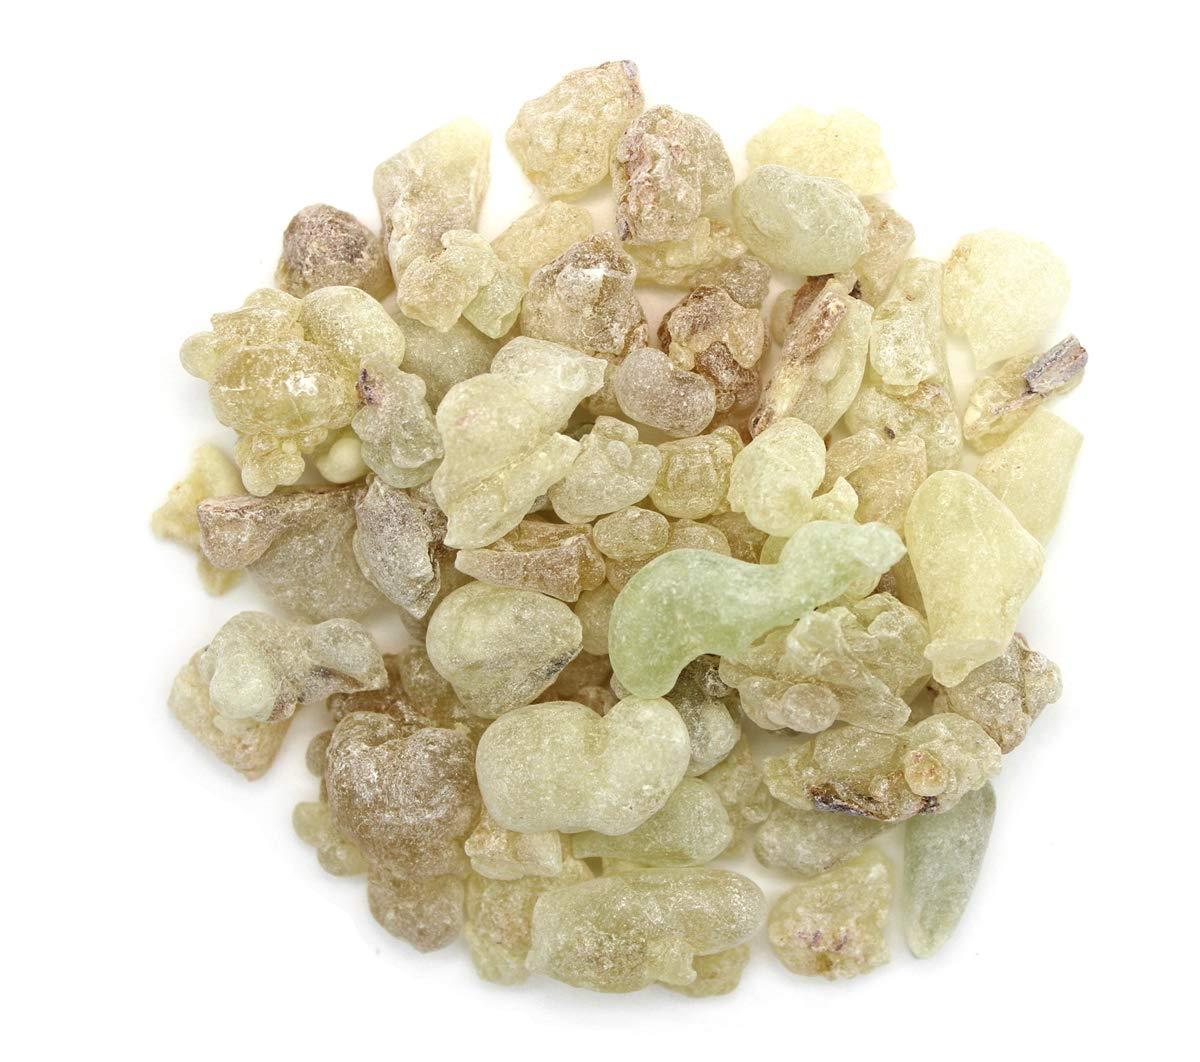 Hygge Aromatics Royal Hojari Frankincense - Organic - from Oman (Boswellia Sacra) 1/2 Pound